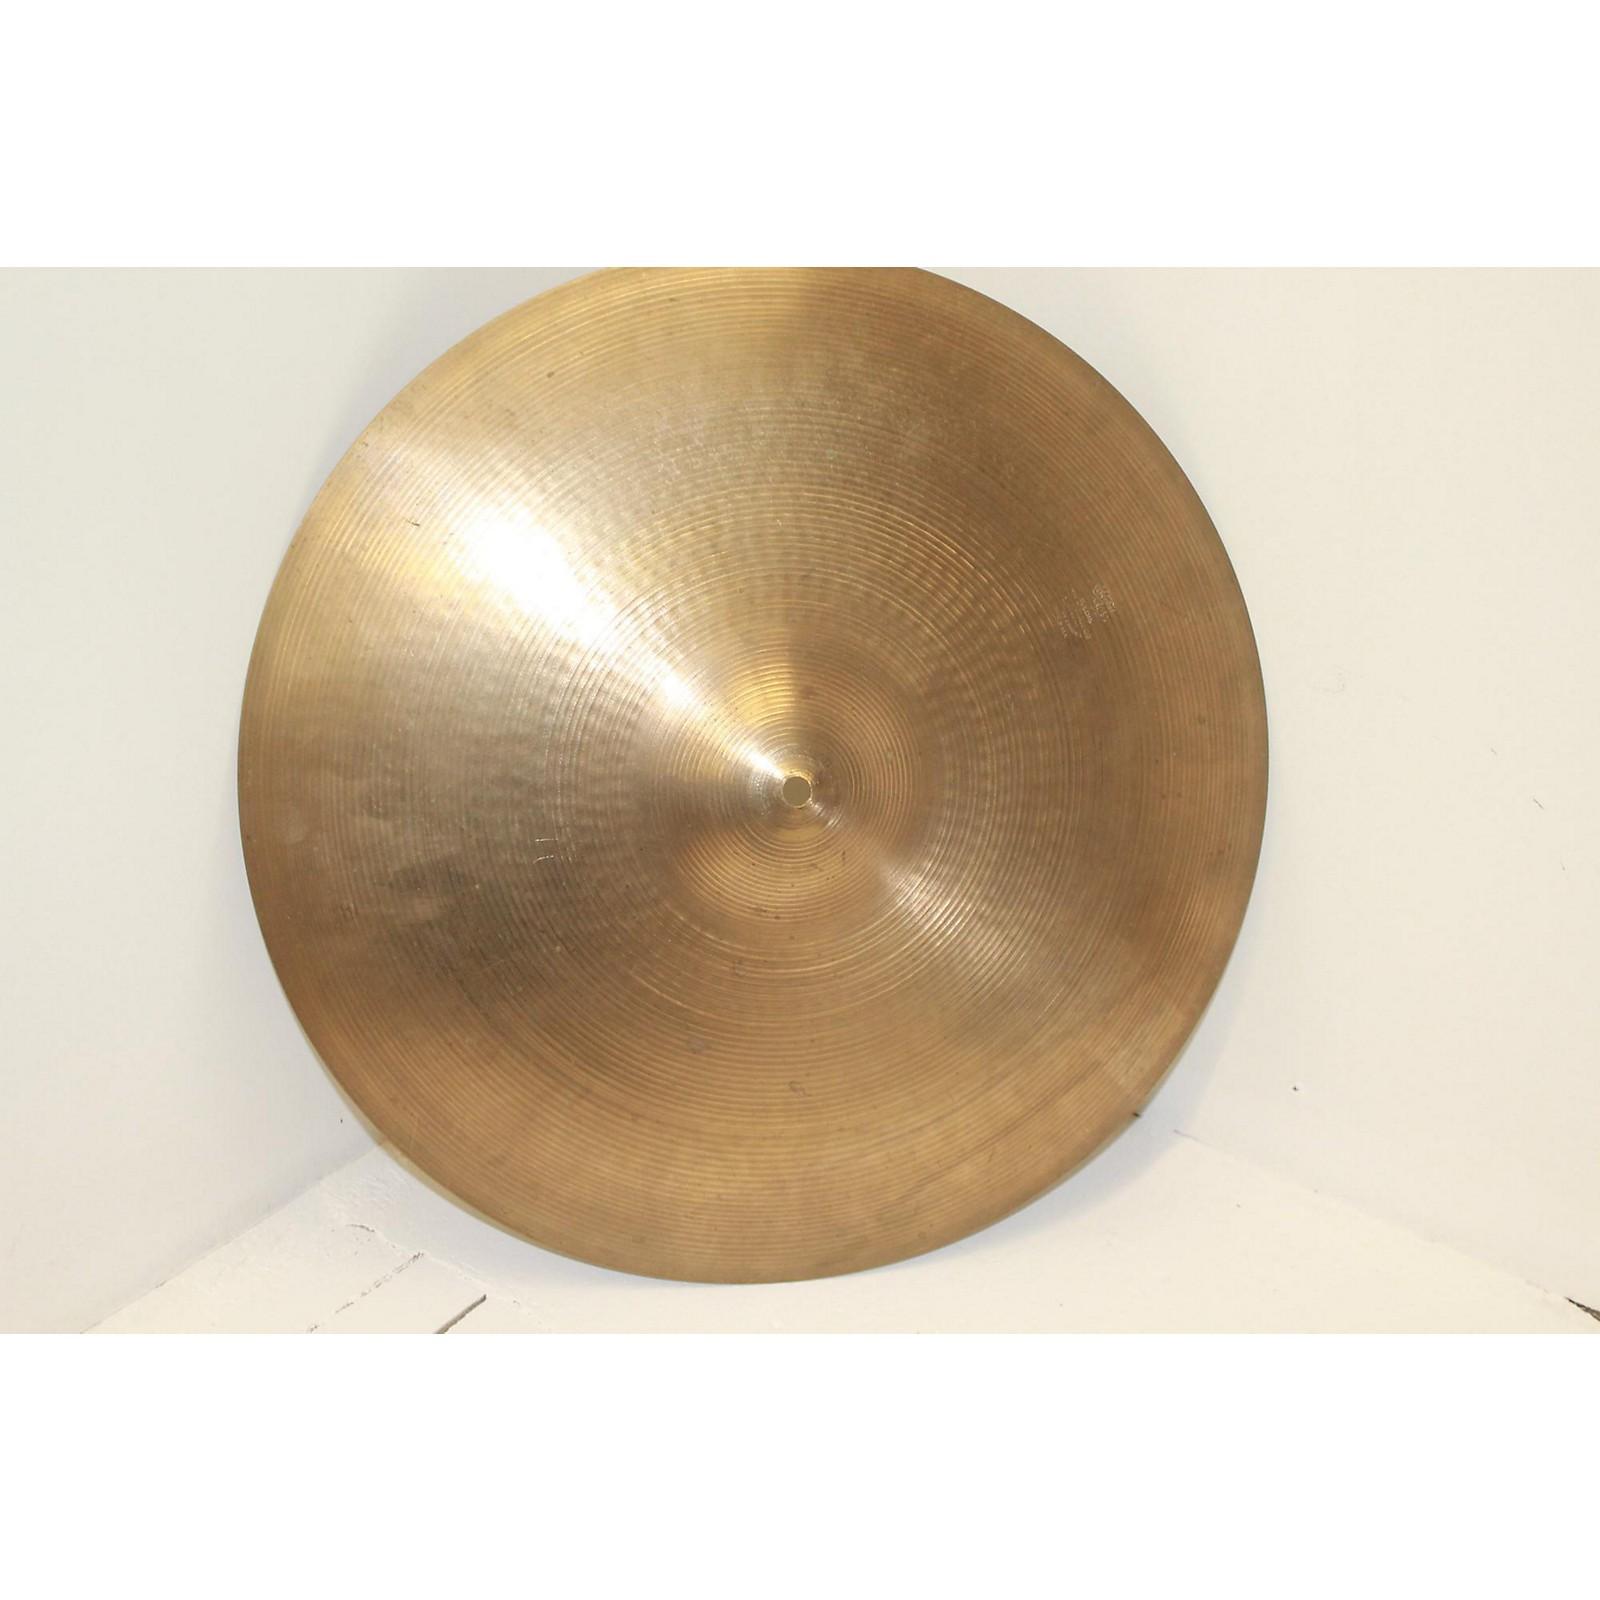 Zildjian 1970s 20in A Series Medium Ride Cymbal